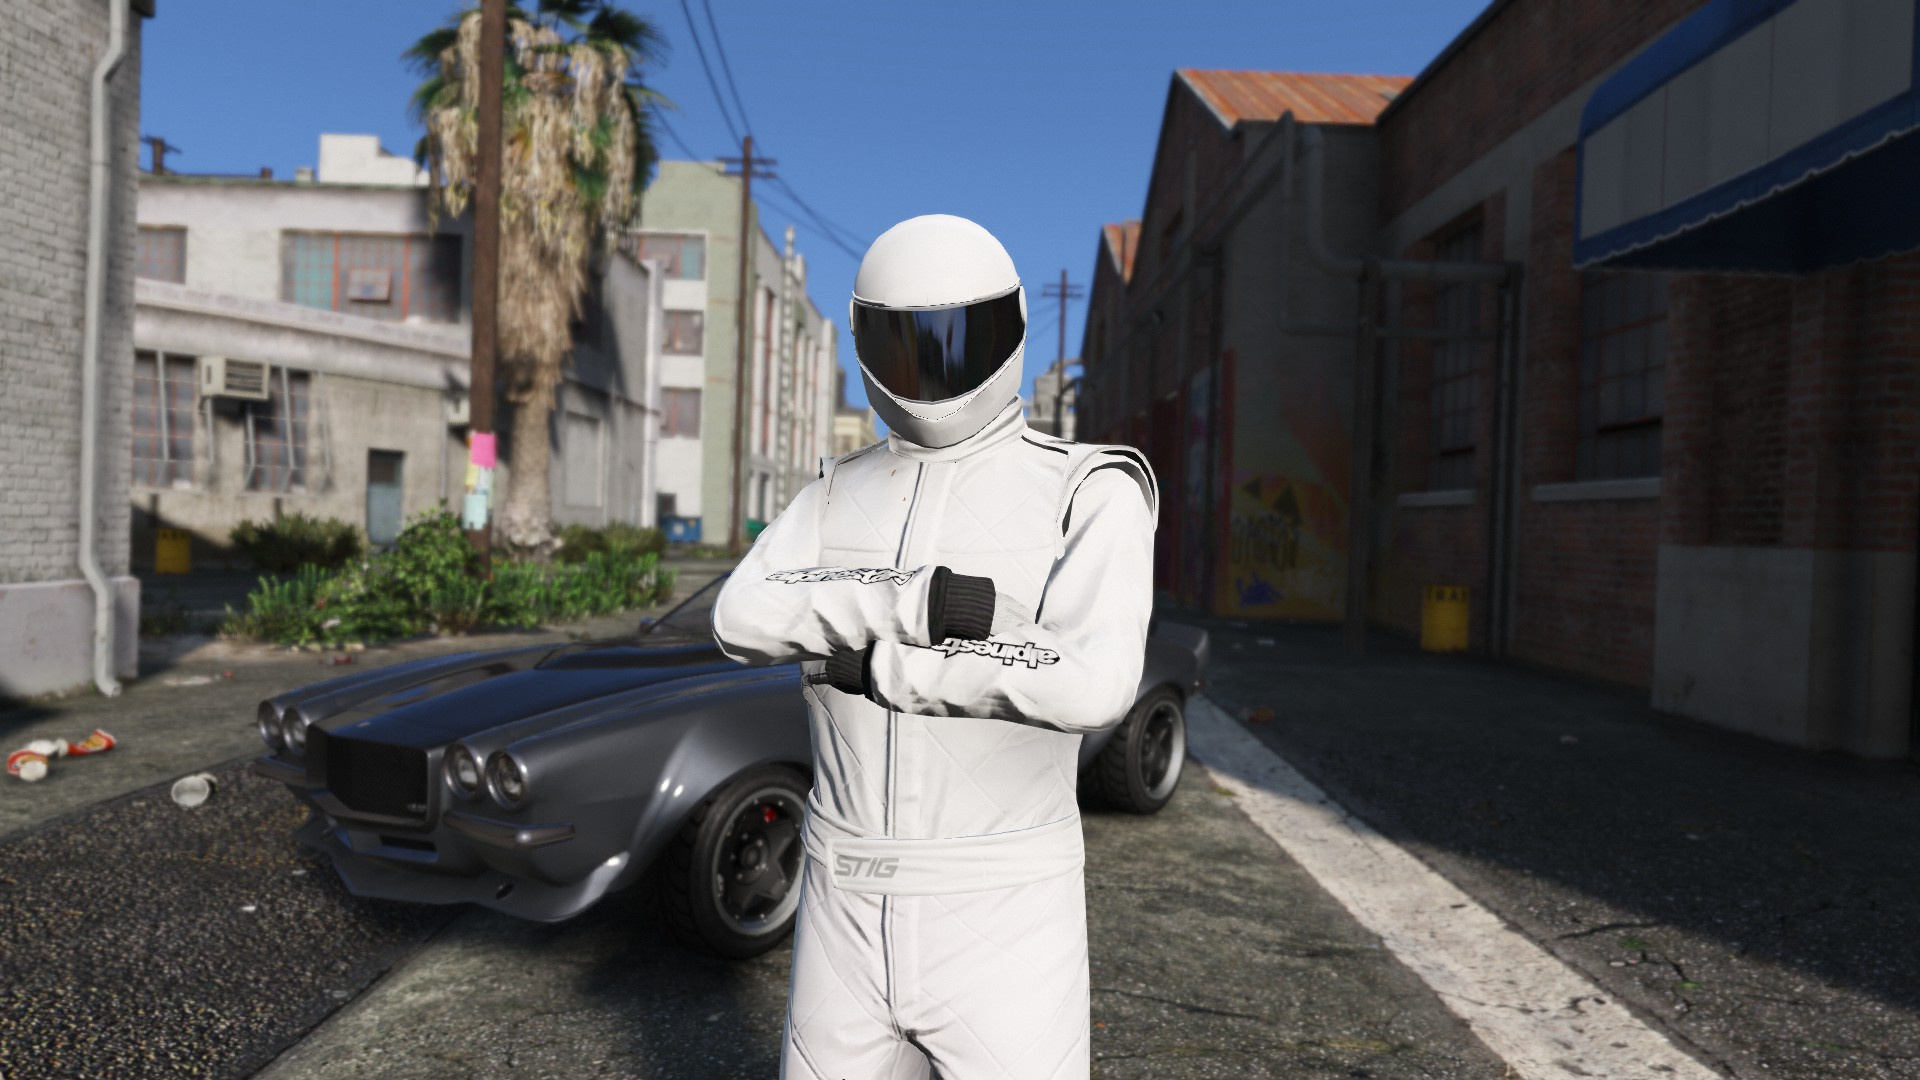 The Stig Racing Suit - GTA5-Mods.com